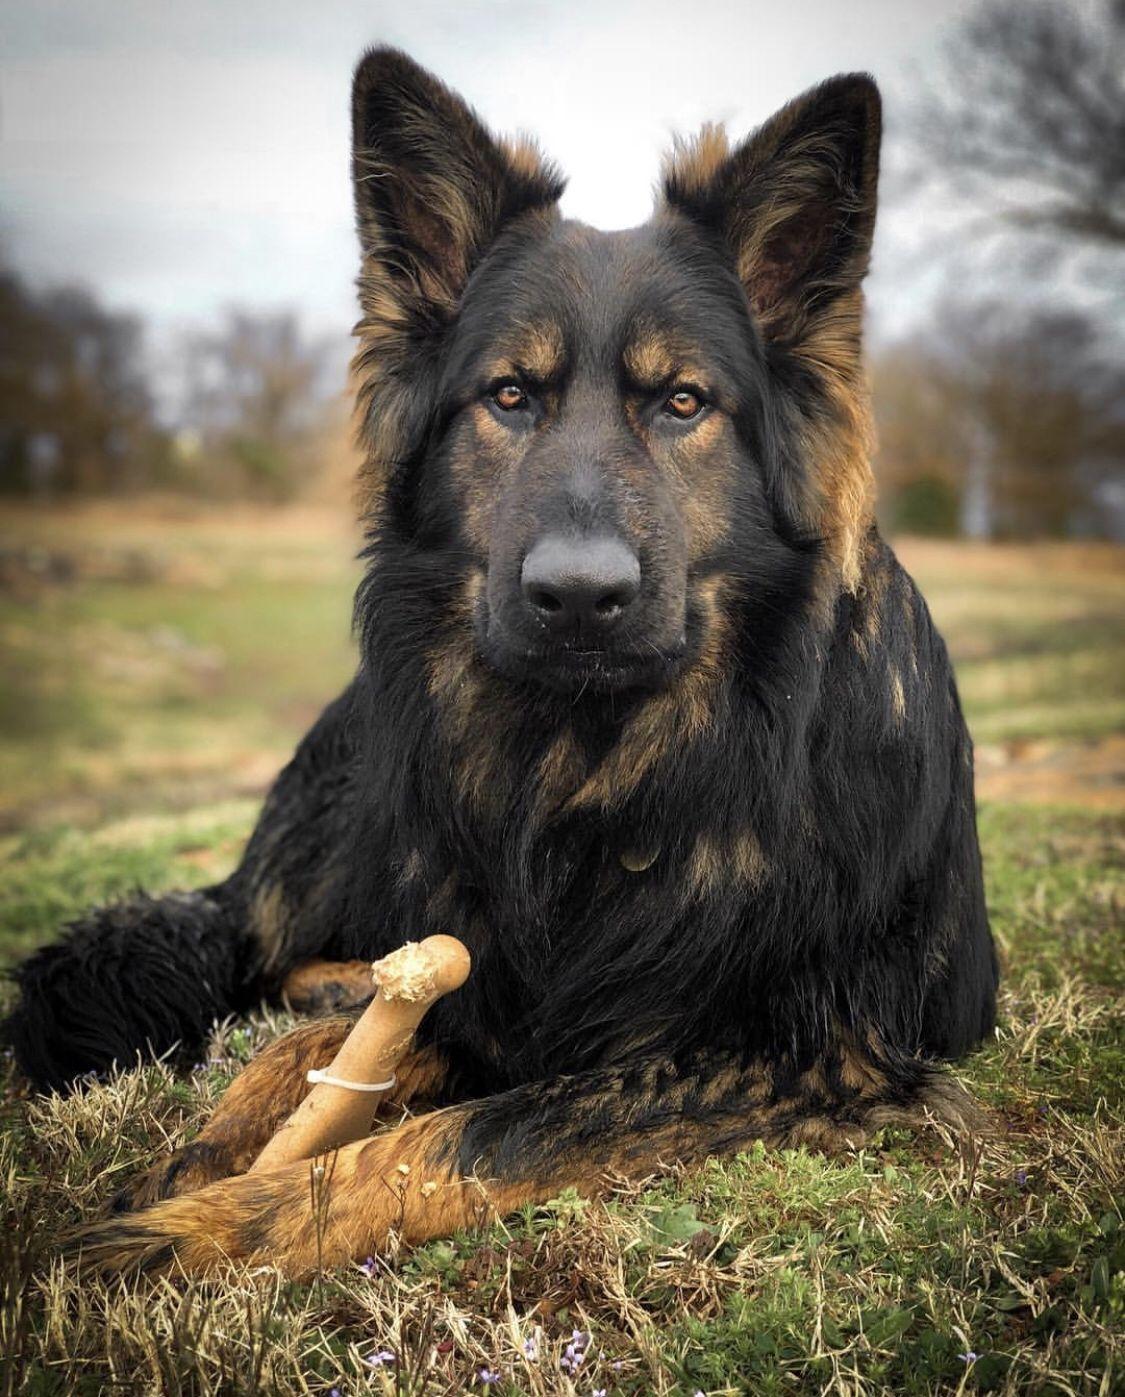 Pin By Lara Younes On G4p Photoshoot Lion Dog German